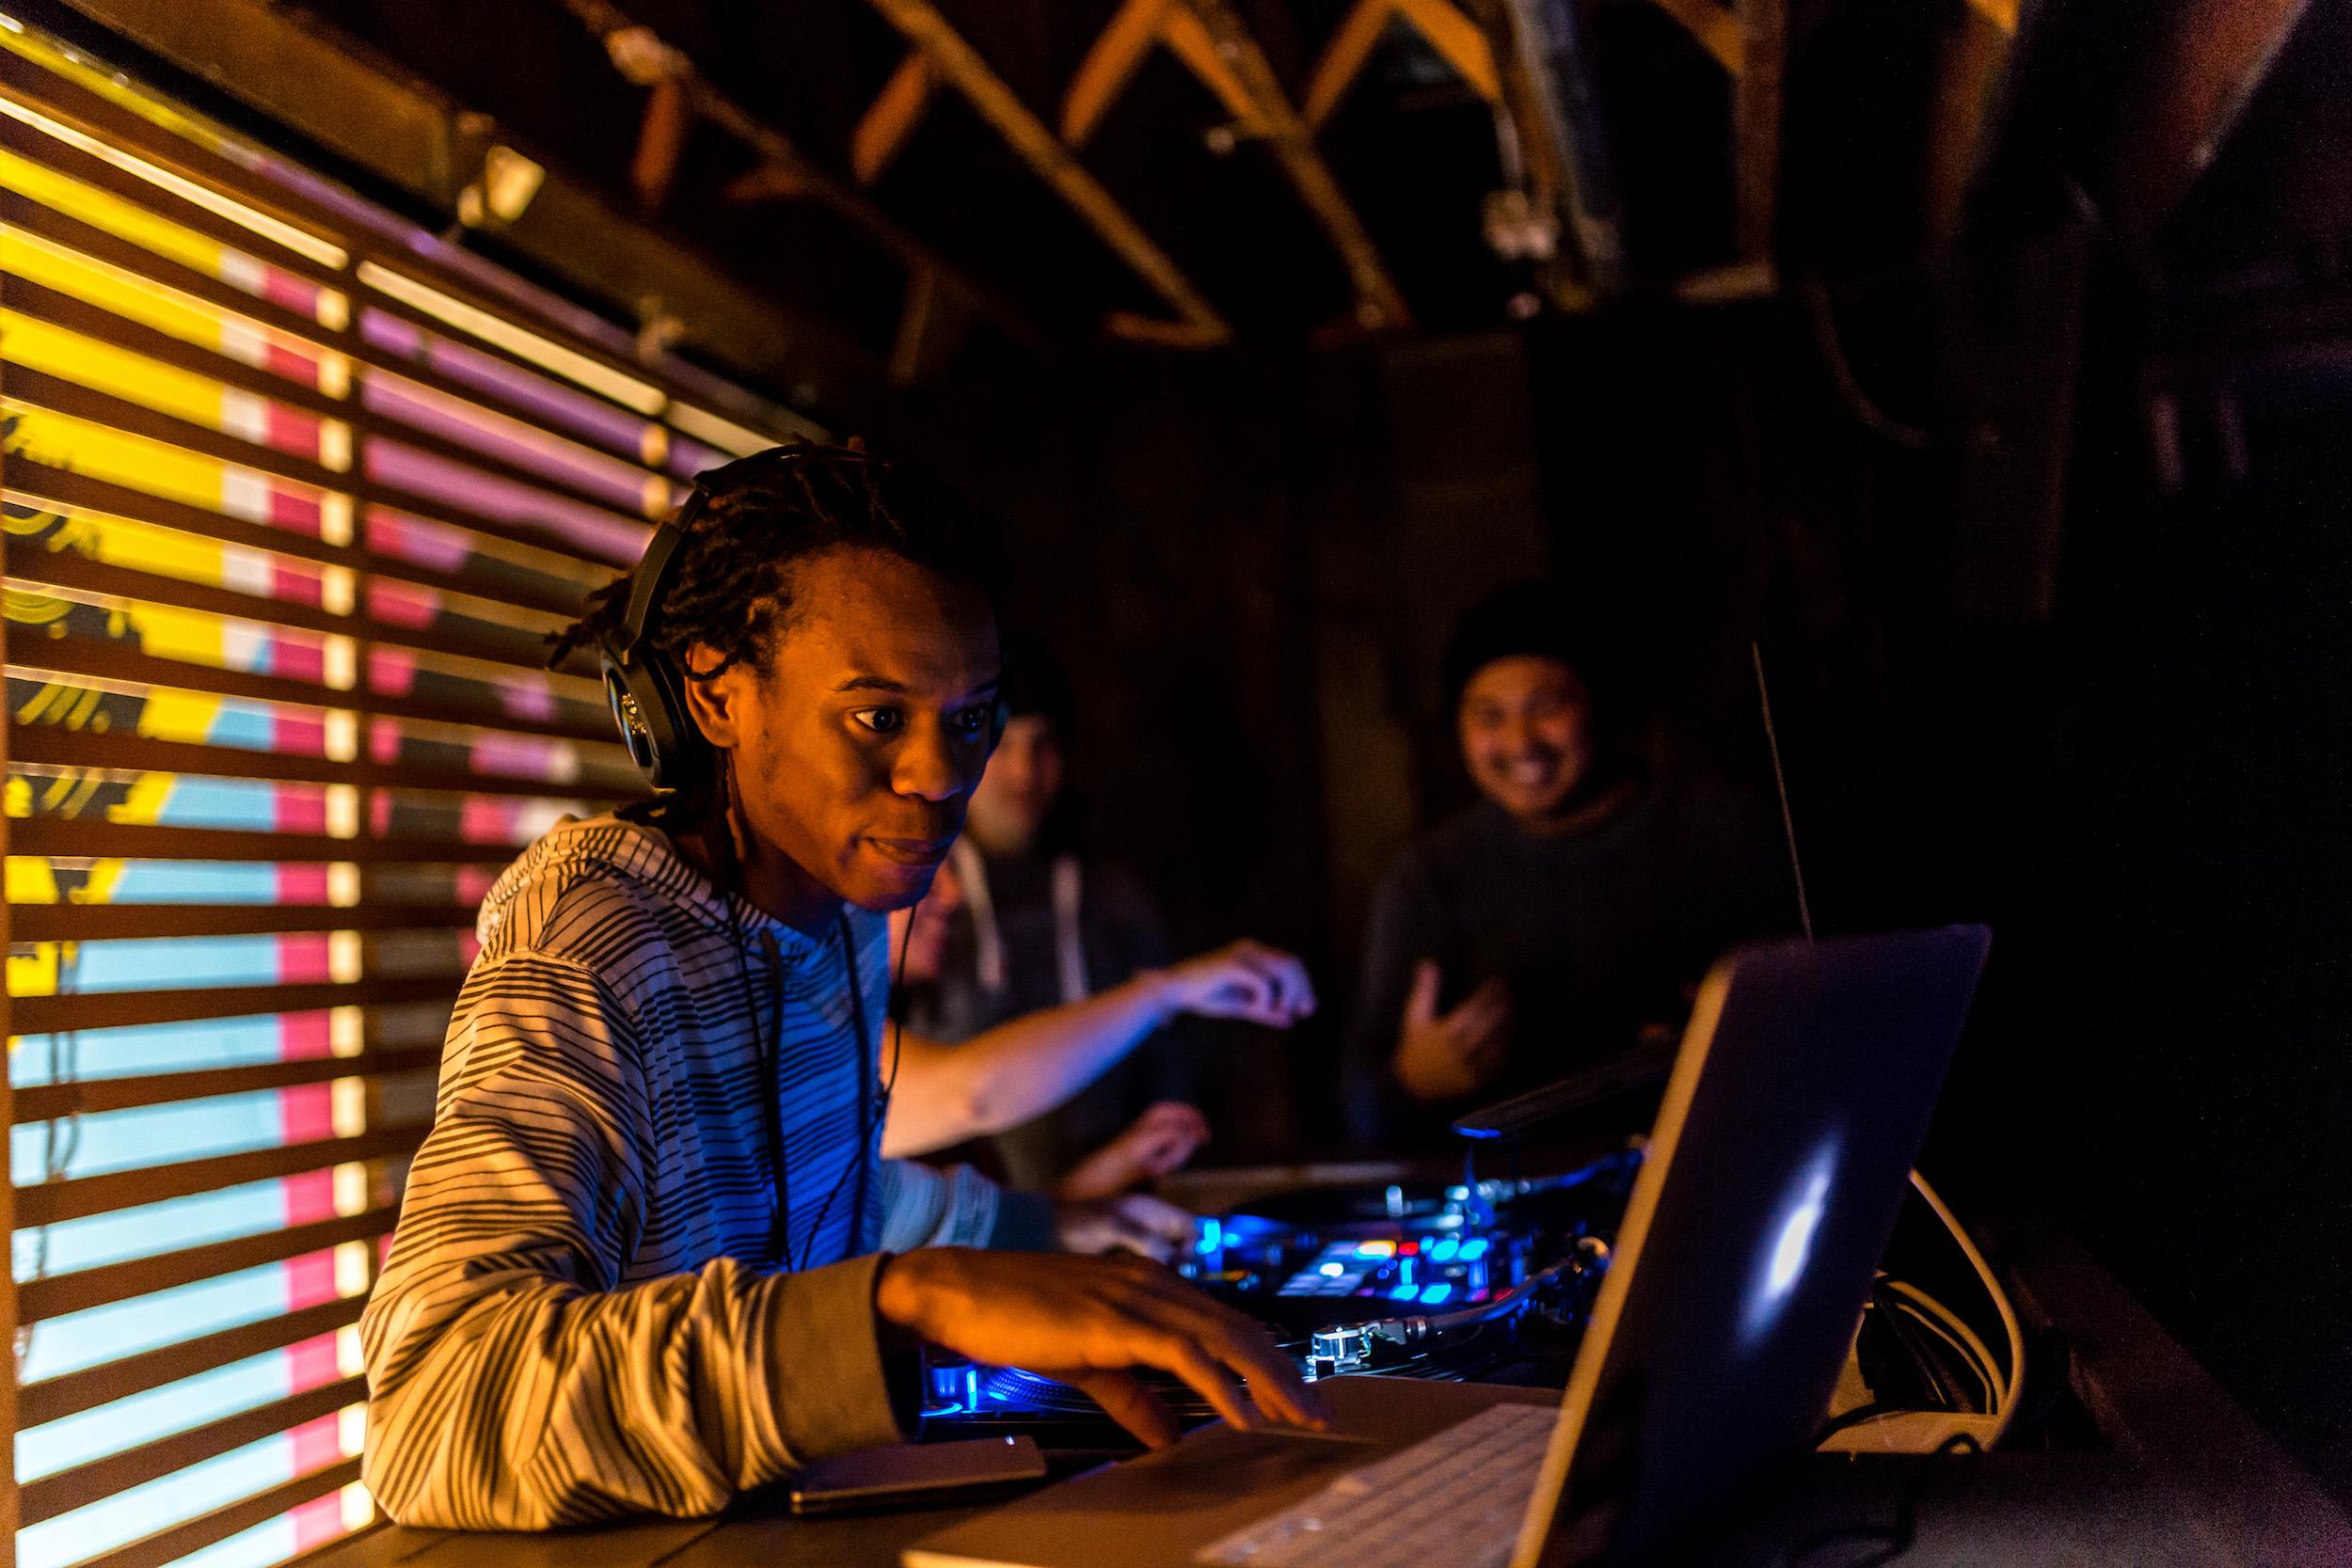 Beat+Drop+DJ+Student.jpg